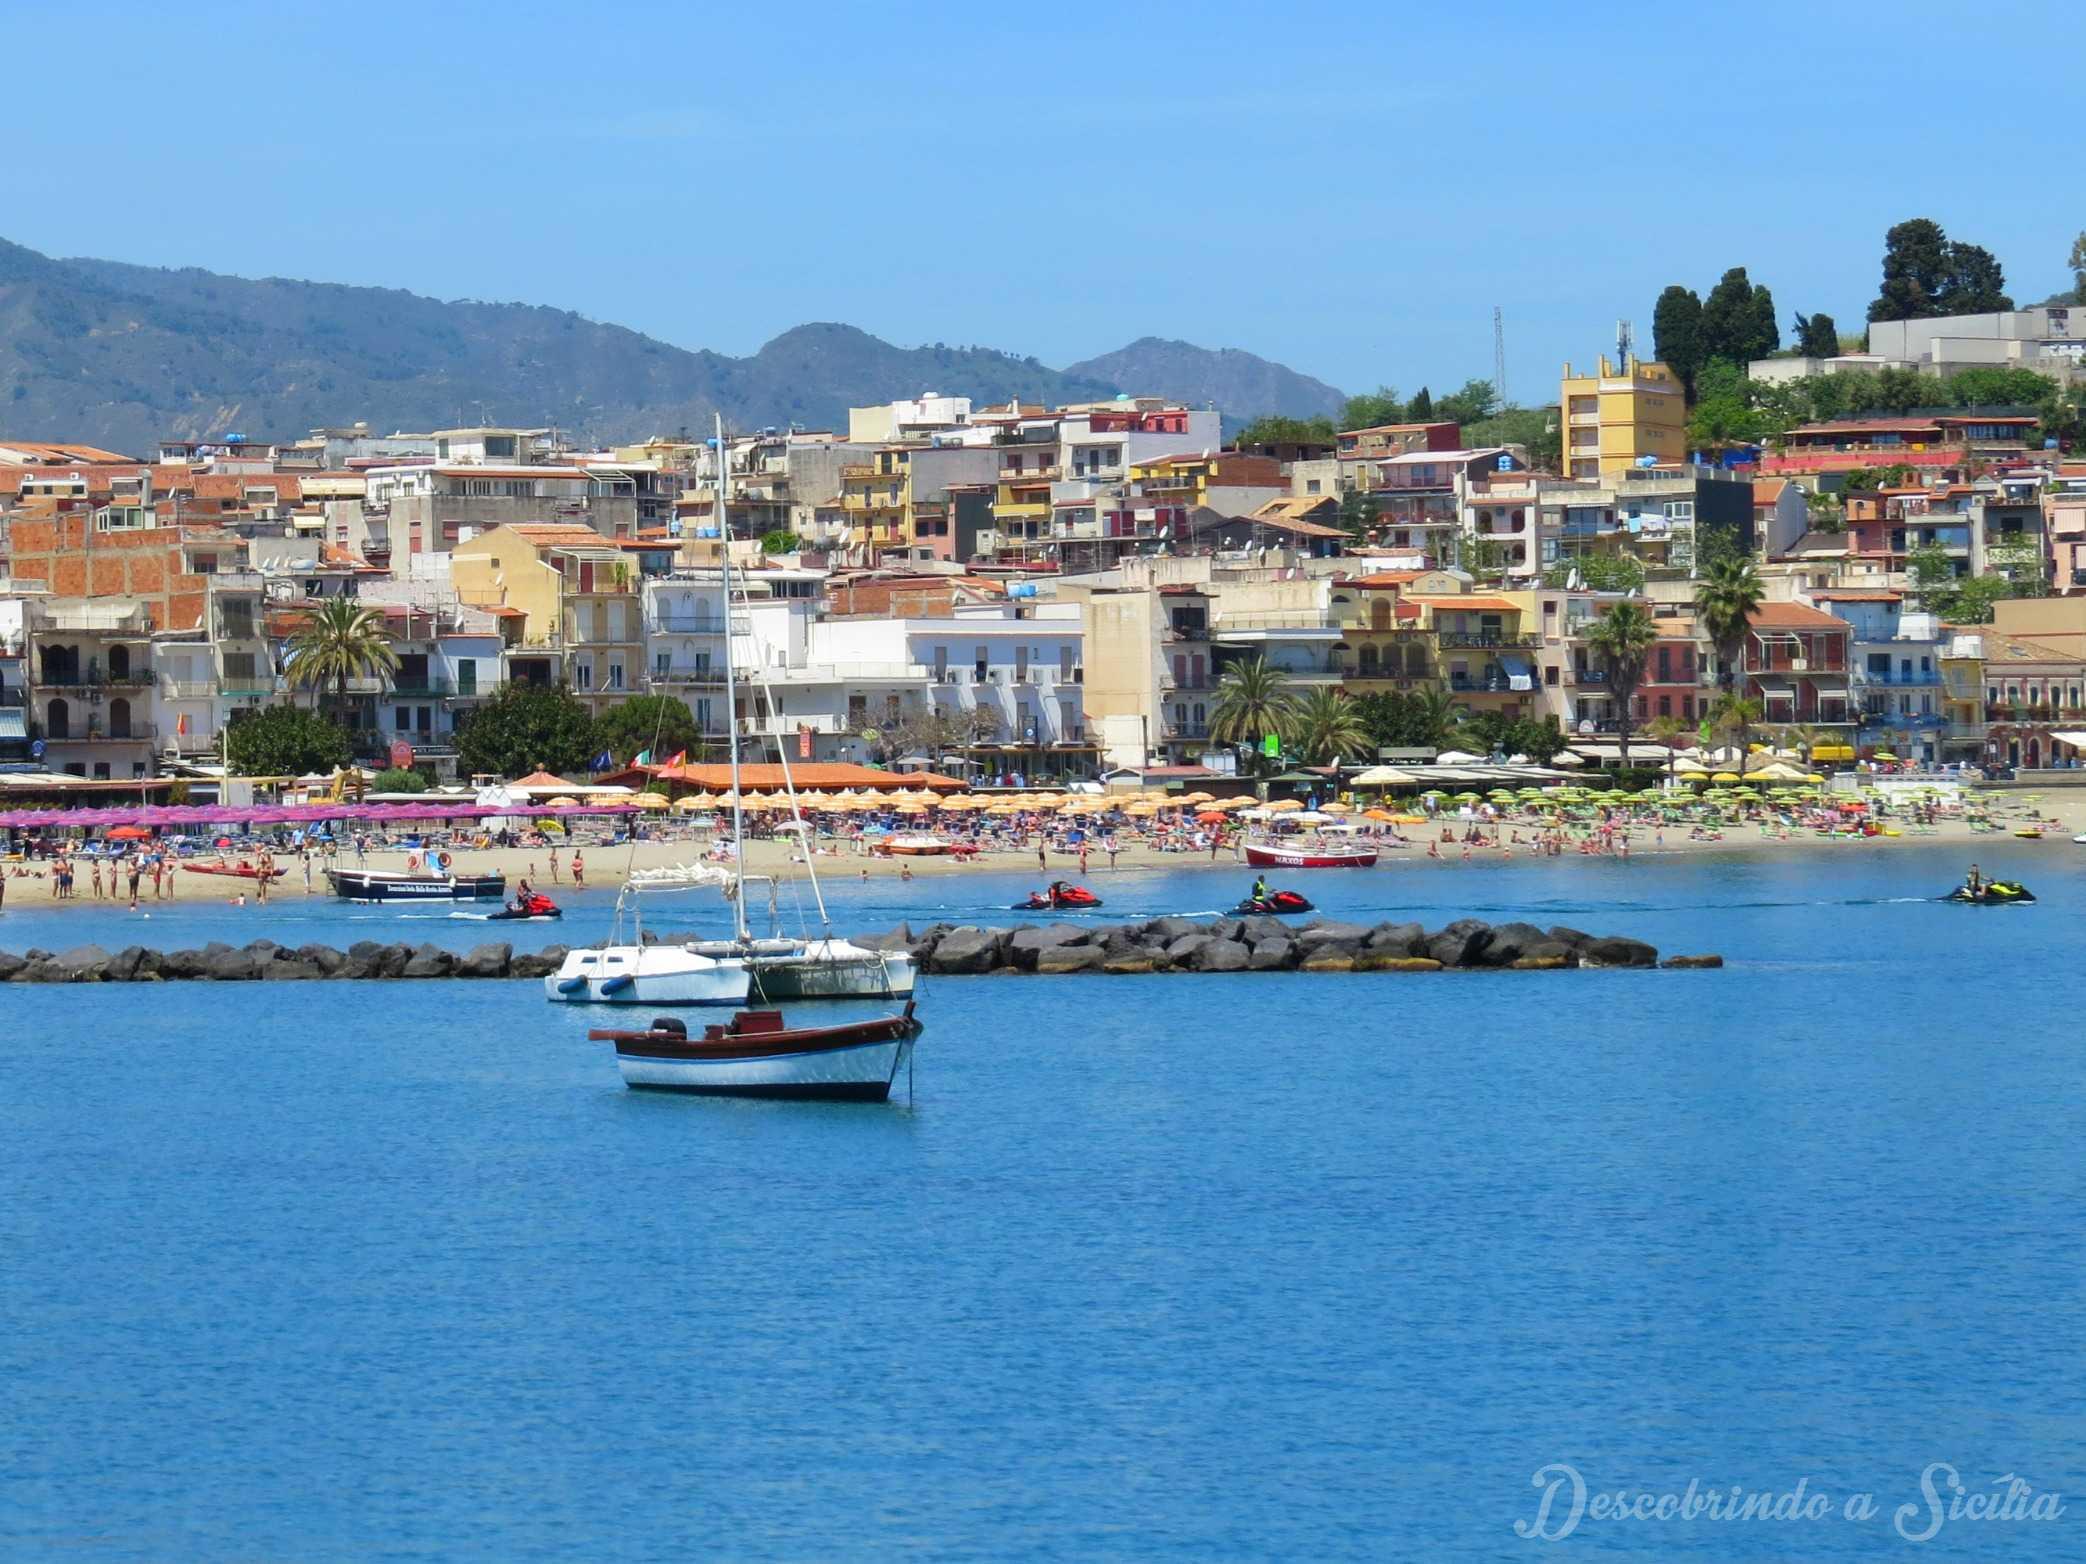 Giardini Naxos: Explorando os arredores de Taormina